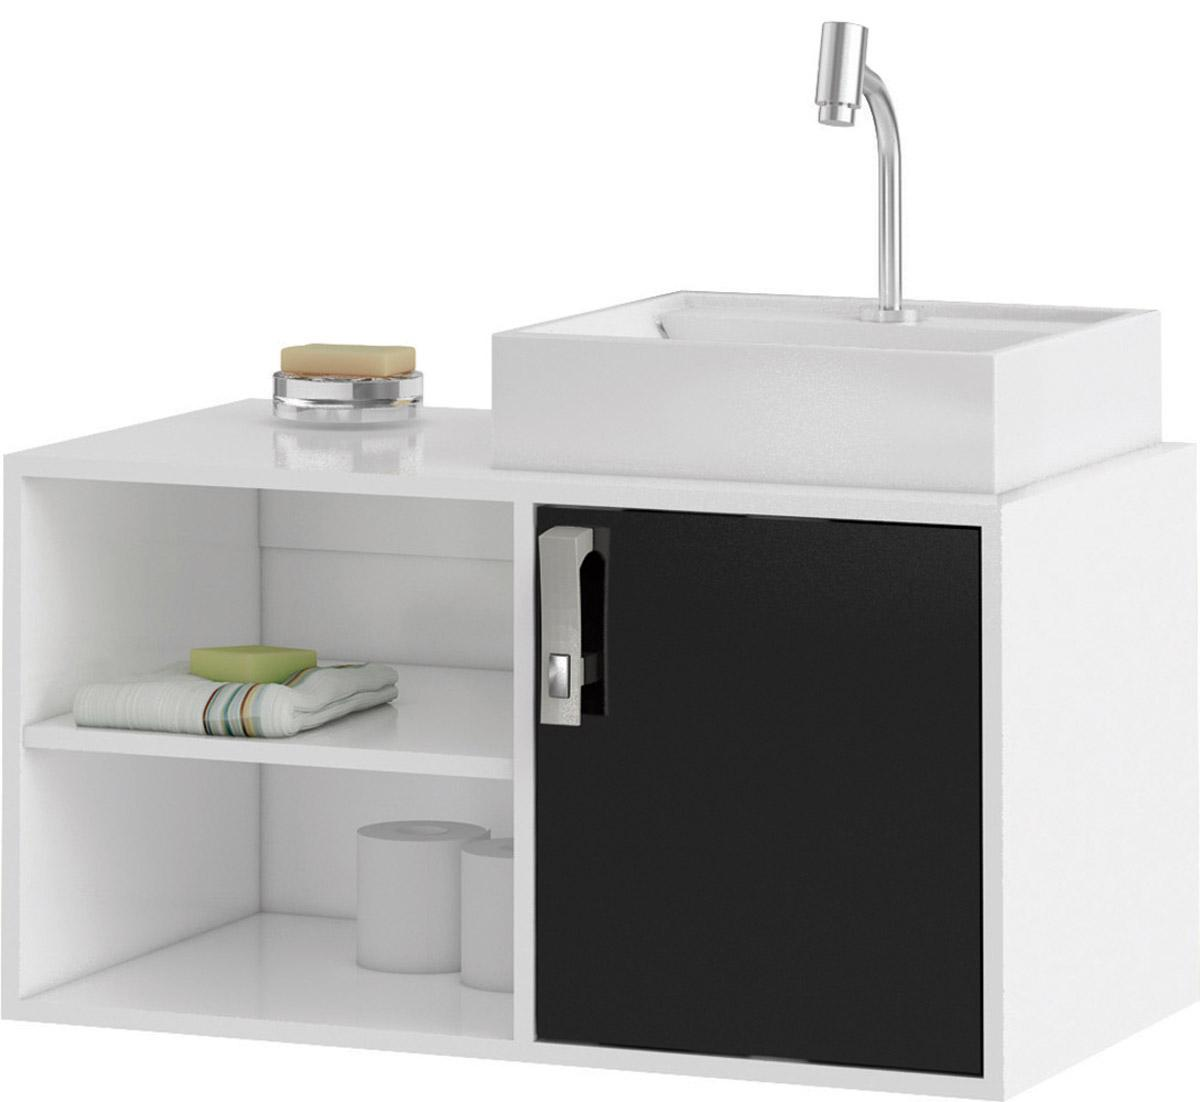 Gabinete de Banheiro Valencia - Branco/Preto - Mgm